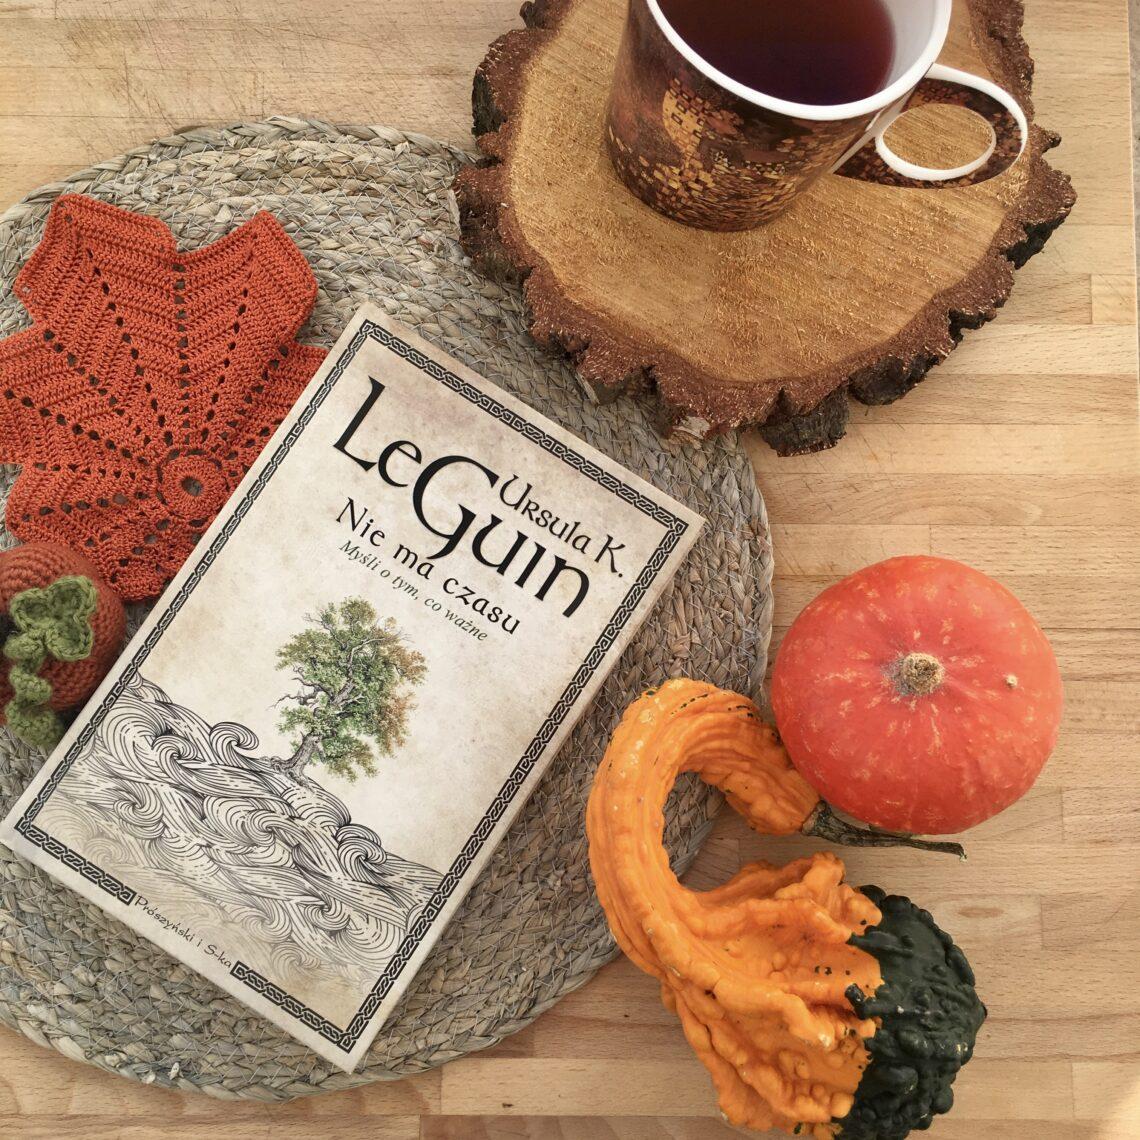 Nie ma czasu. Ursula K. Le Guin